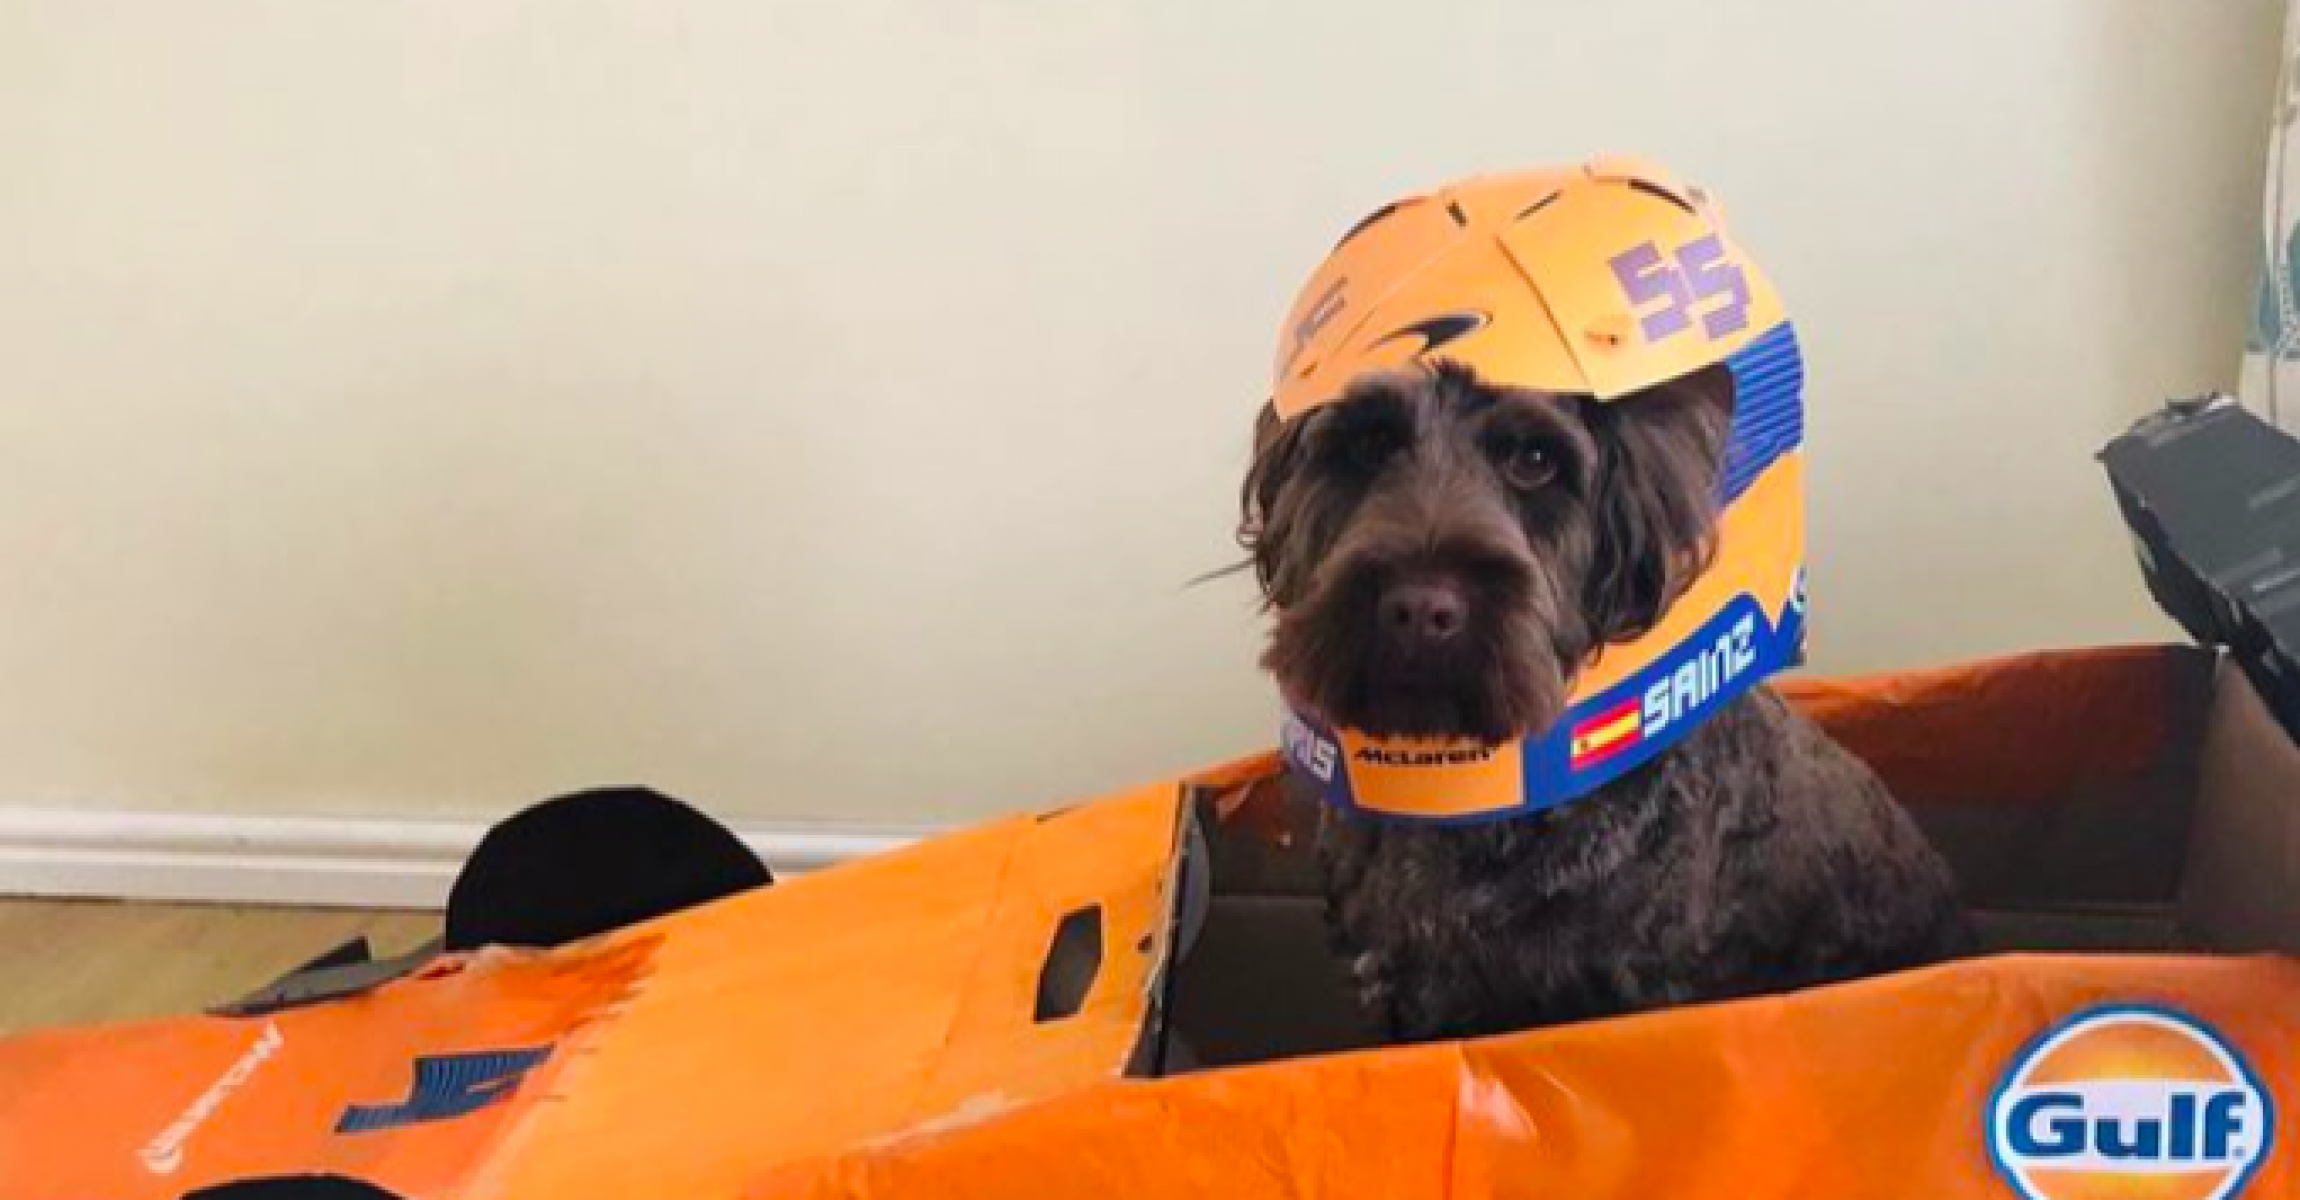 @mclarendoggo, Fraggile Instagram dog kutya